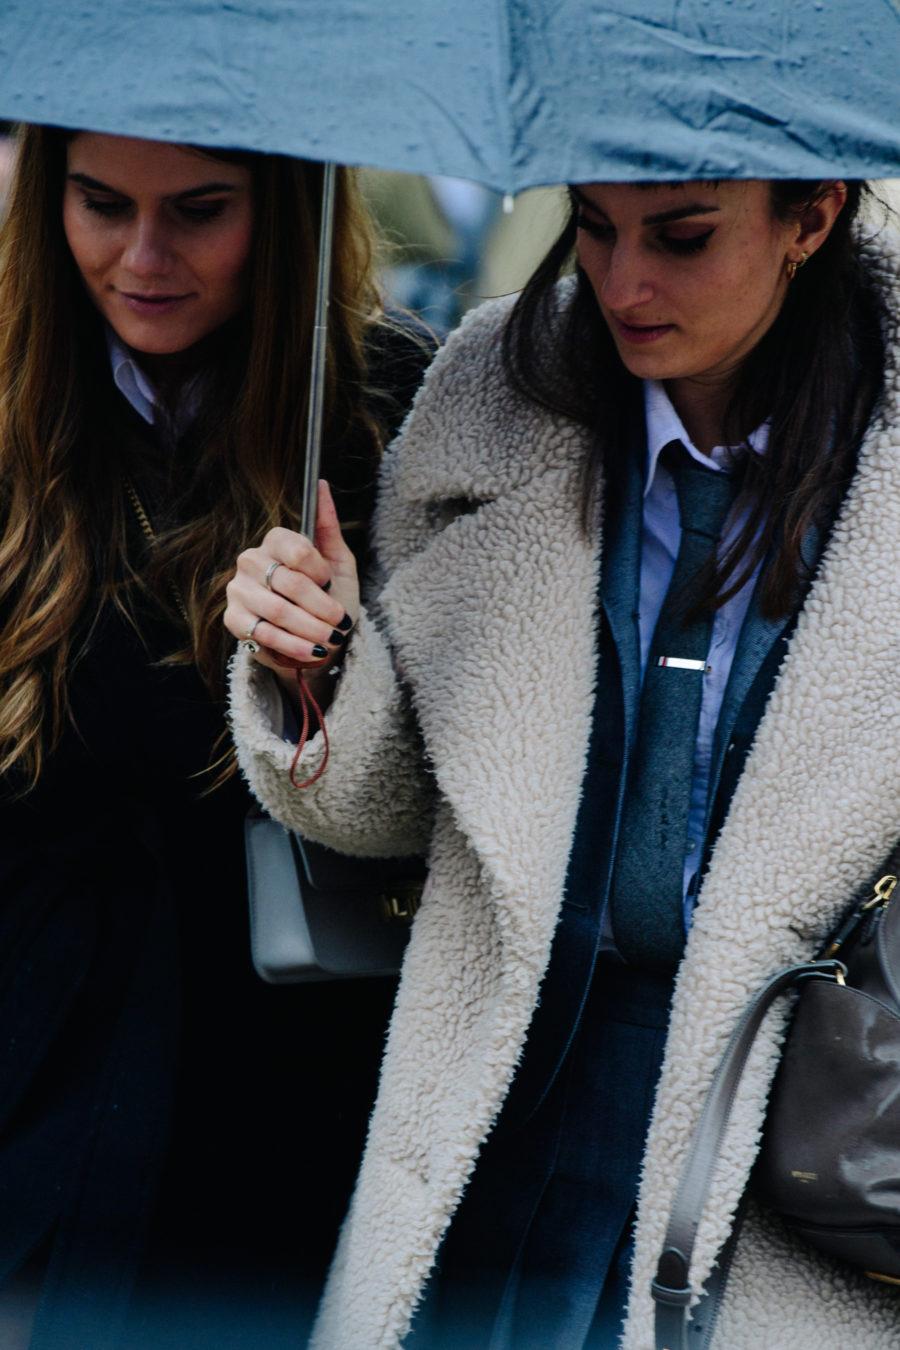 Women carrying umbrellas